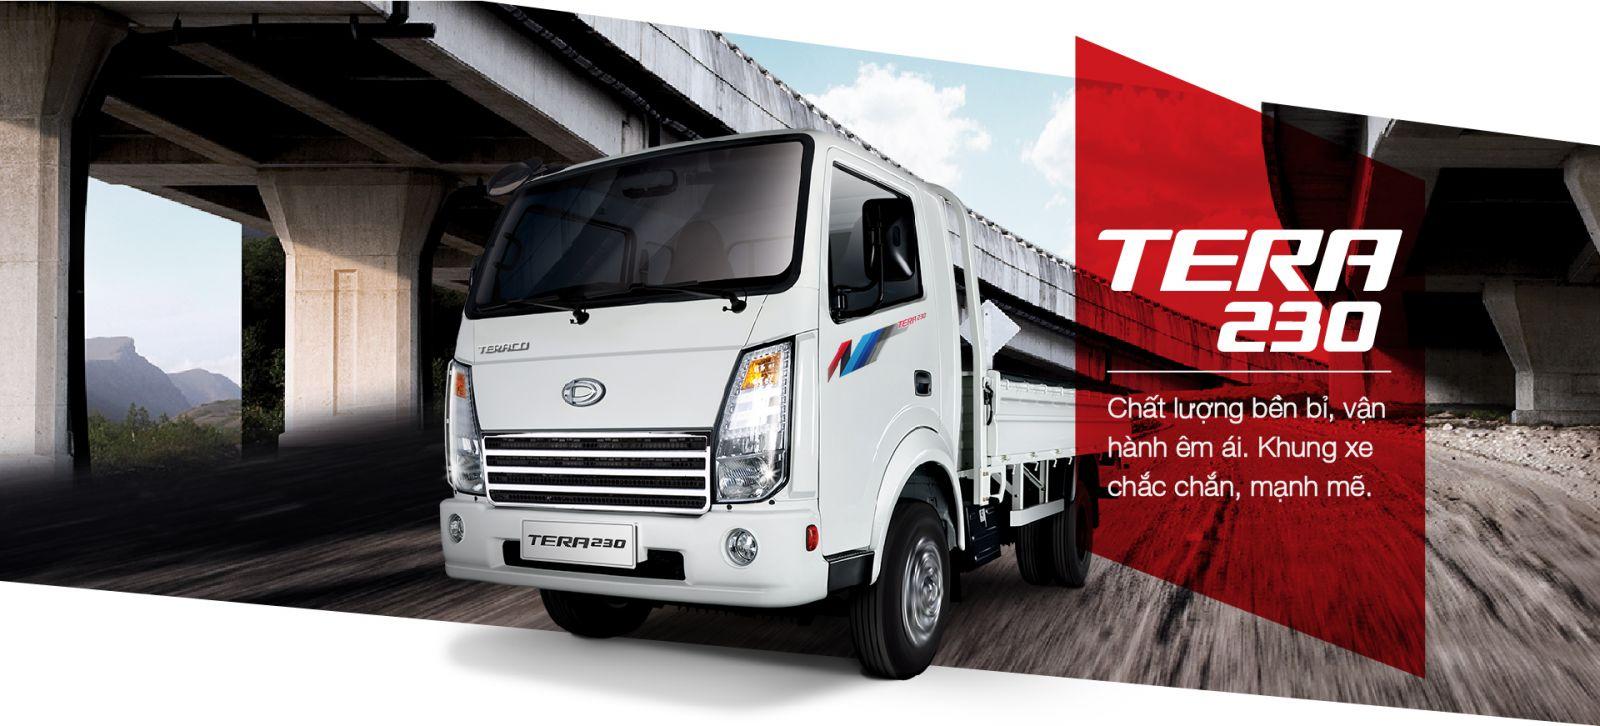 xe tải teraco 230